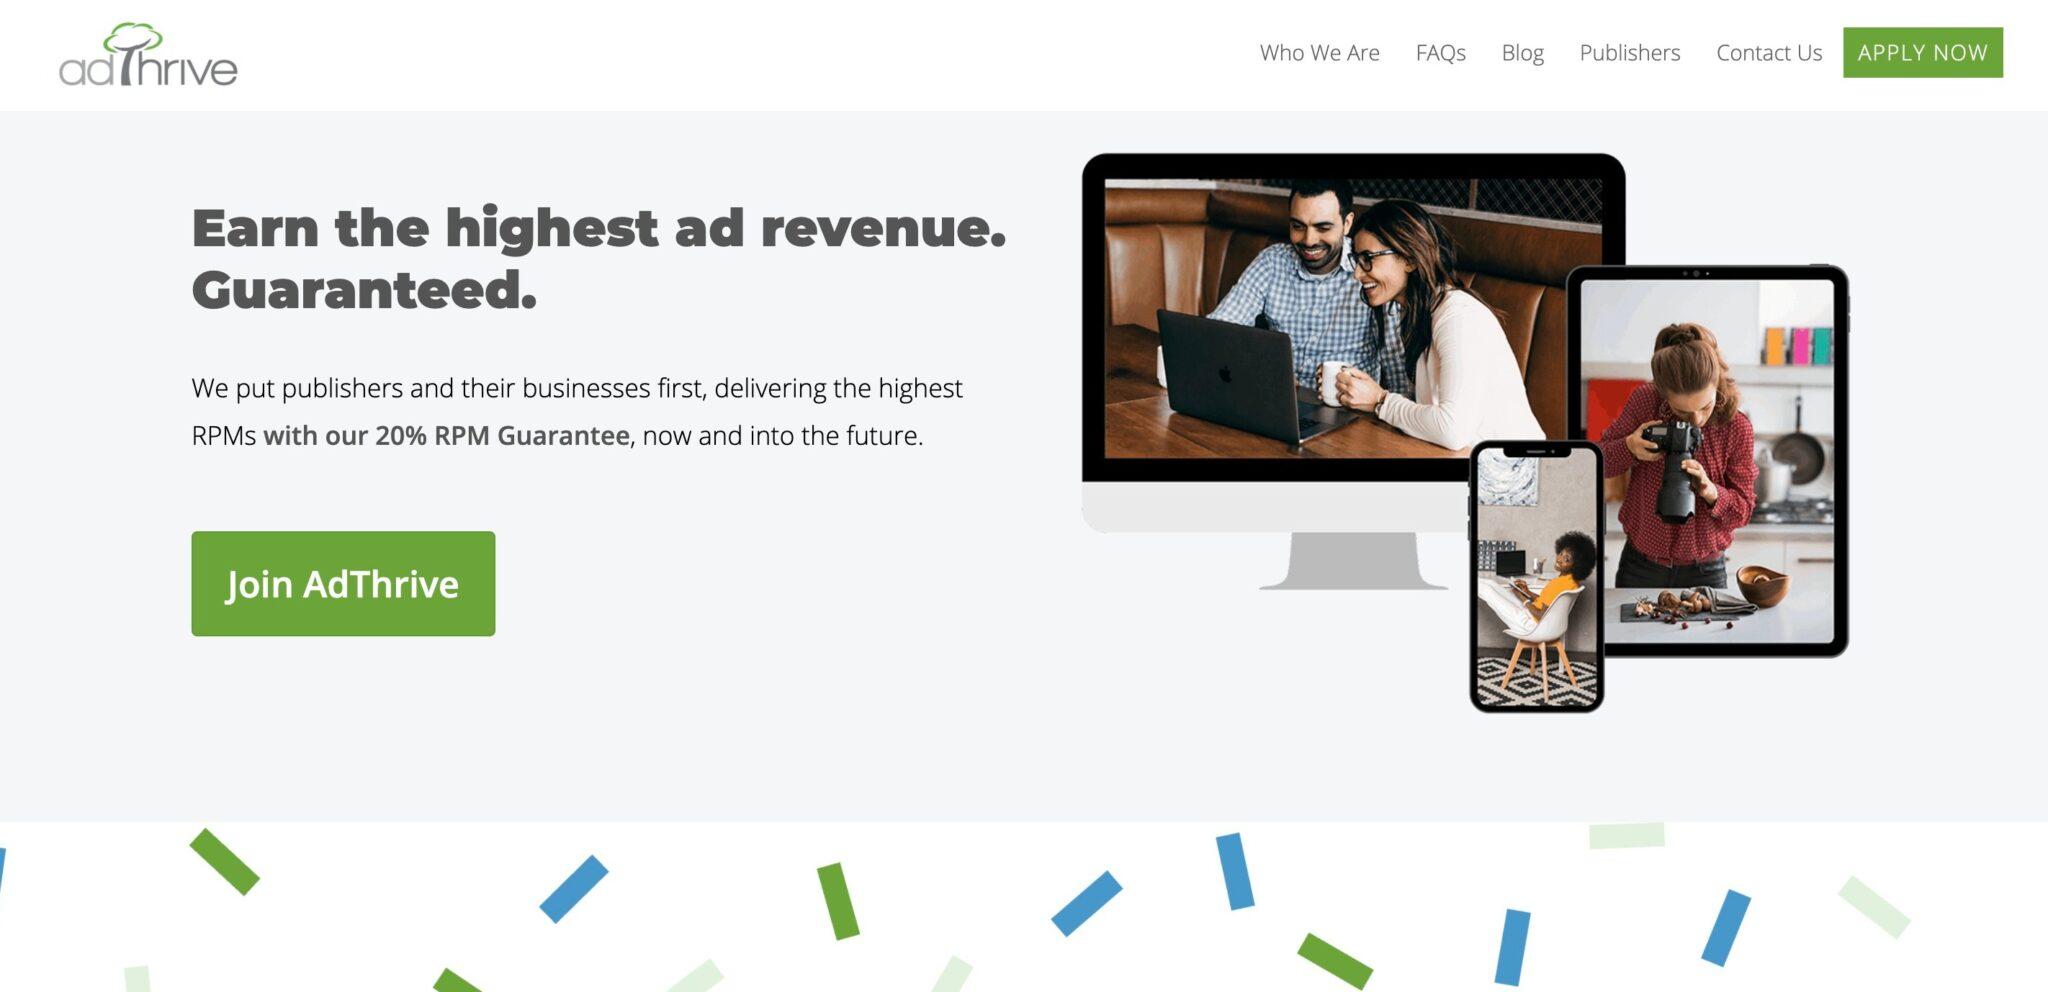 Adthrive, an alternative to Google AdSense